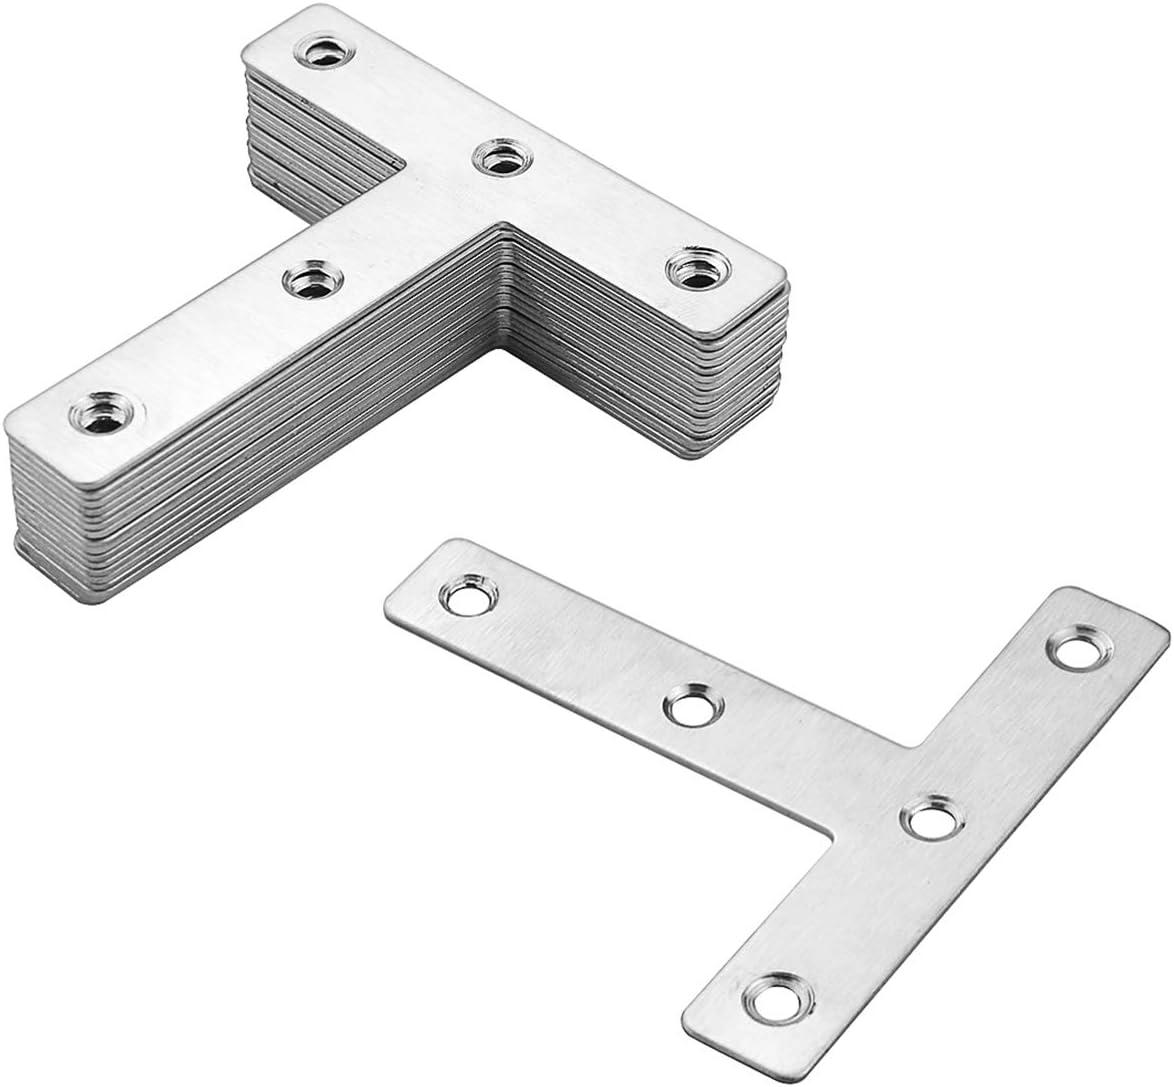 Amersumer 20 Pcs T Shape Flat Repair Plate Bracket, Stainless Steel T Type Repair Mending Plate, Joining Bracket Support Brace for Wood Furniture, Chests, Windows, Desks (80mm x 80mm)